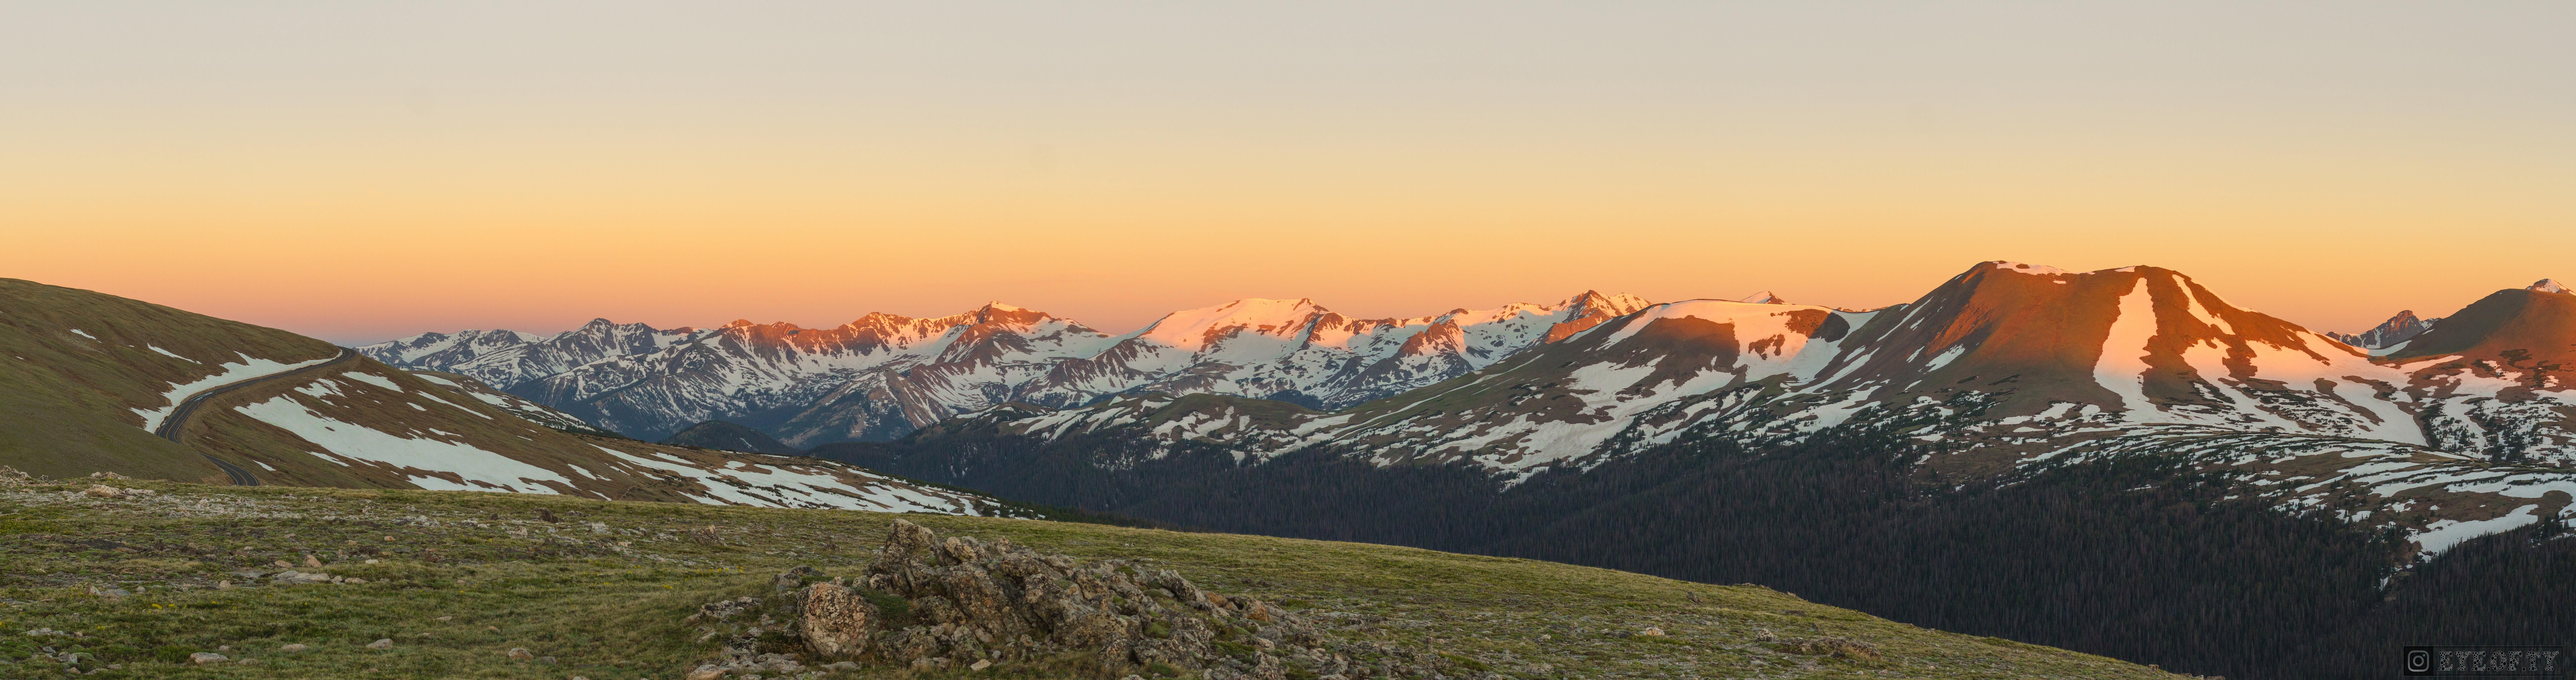 Panorama Of The Alpine Tundra And Mountain Landscape Along Trail Ridge Ro Rocky Mountain National Park Colorado Rocky Mountain National Park Mountain Landscape